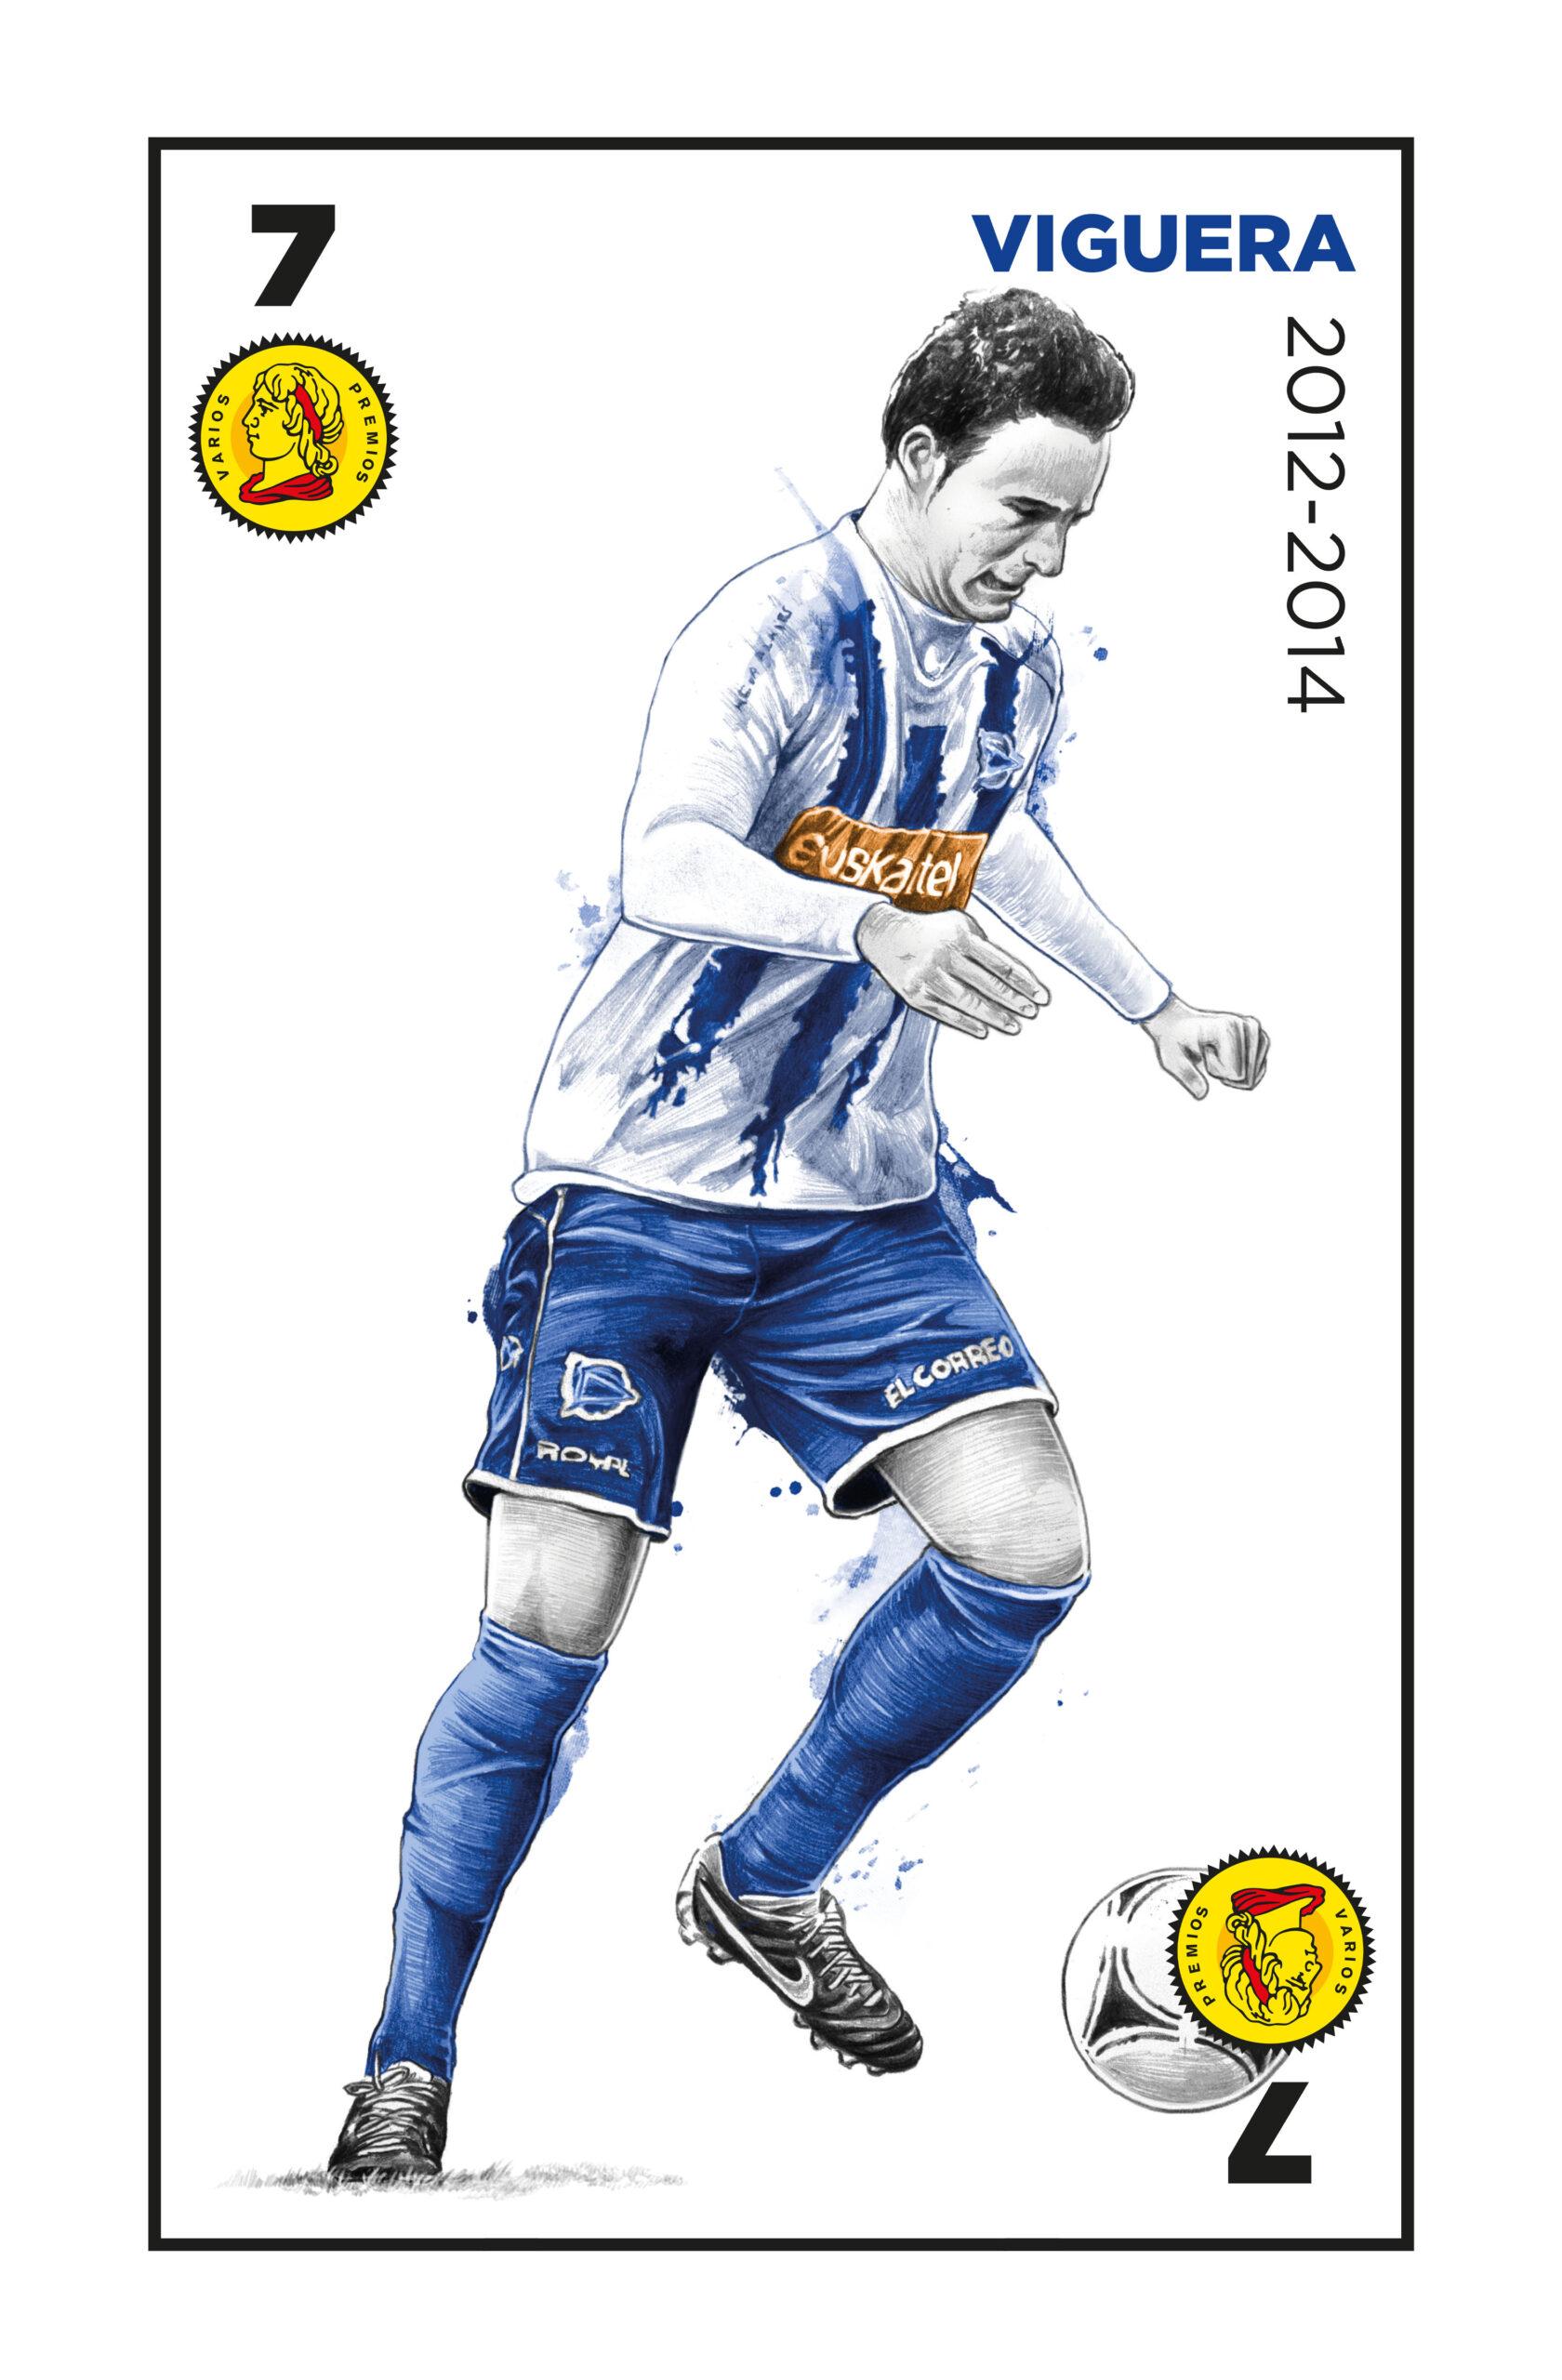 Borja Viguera